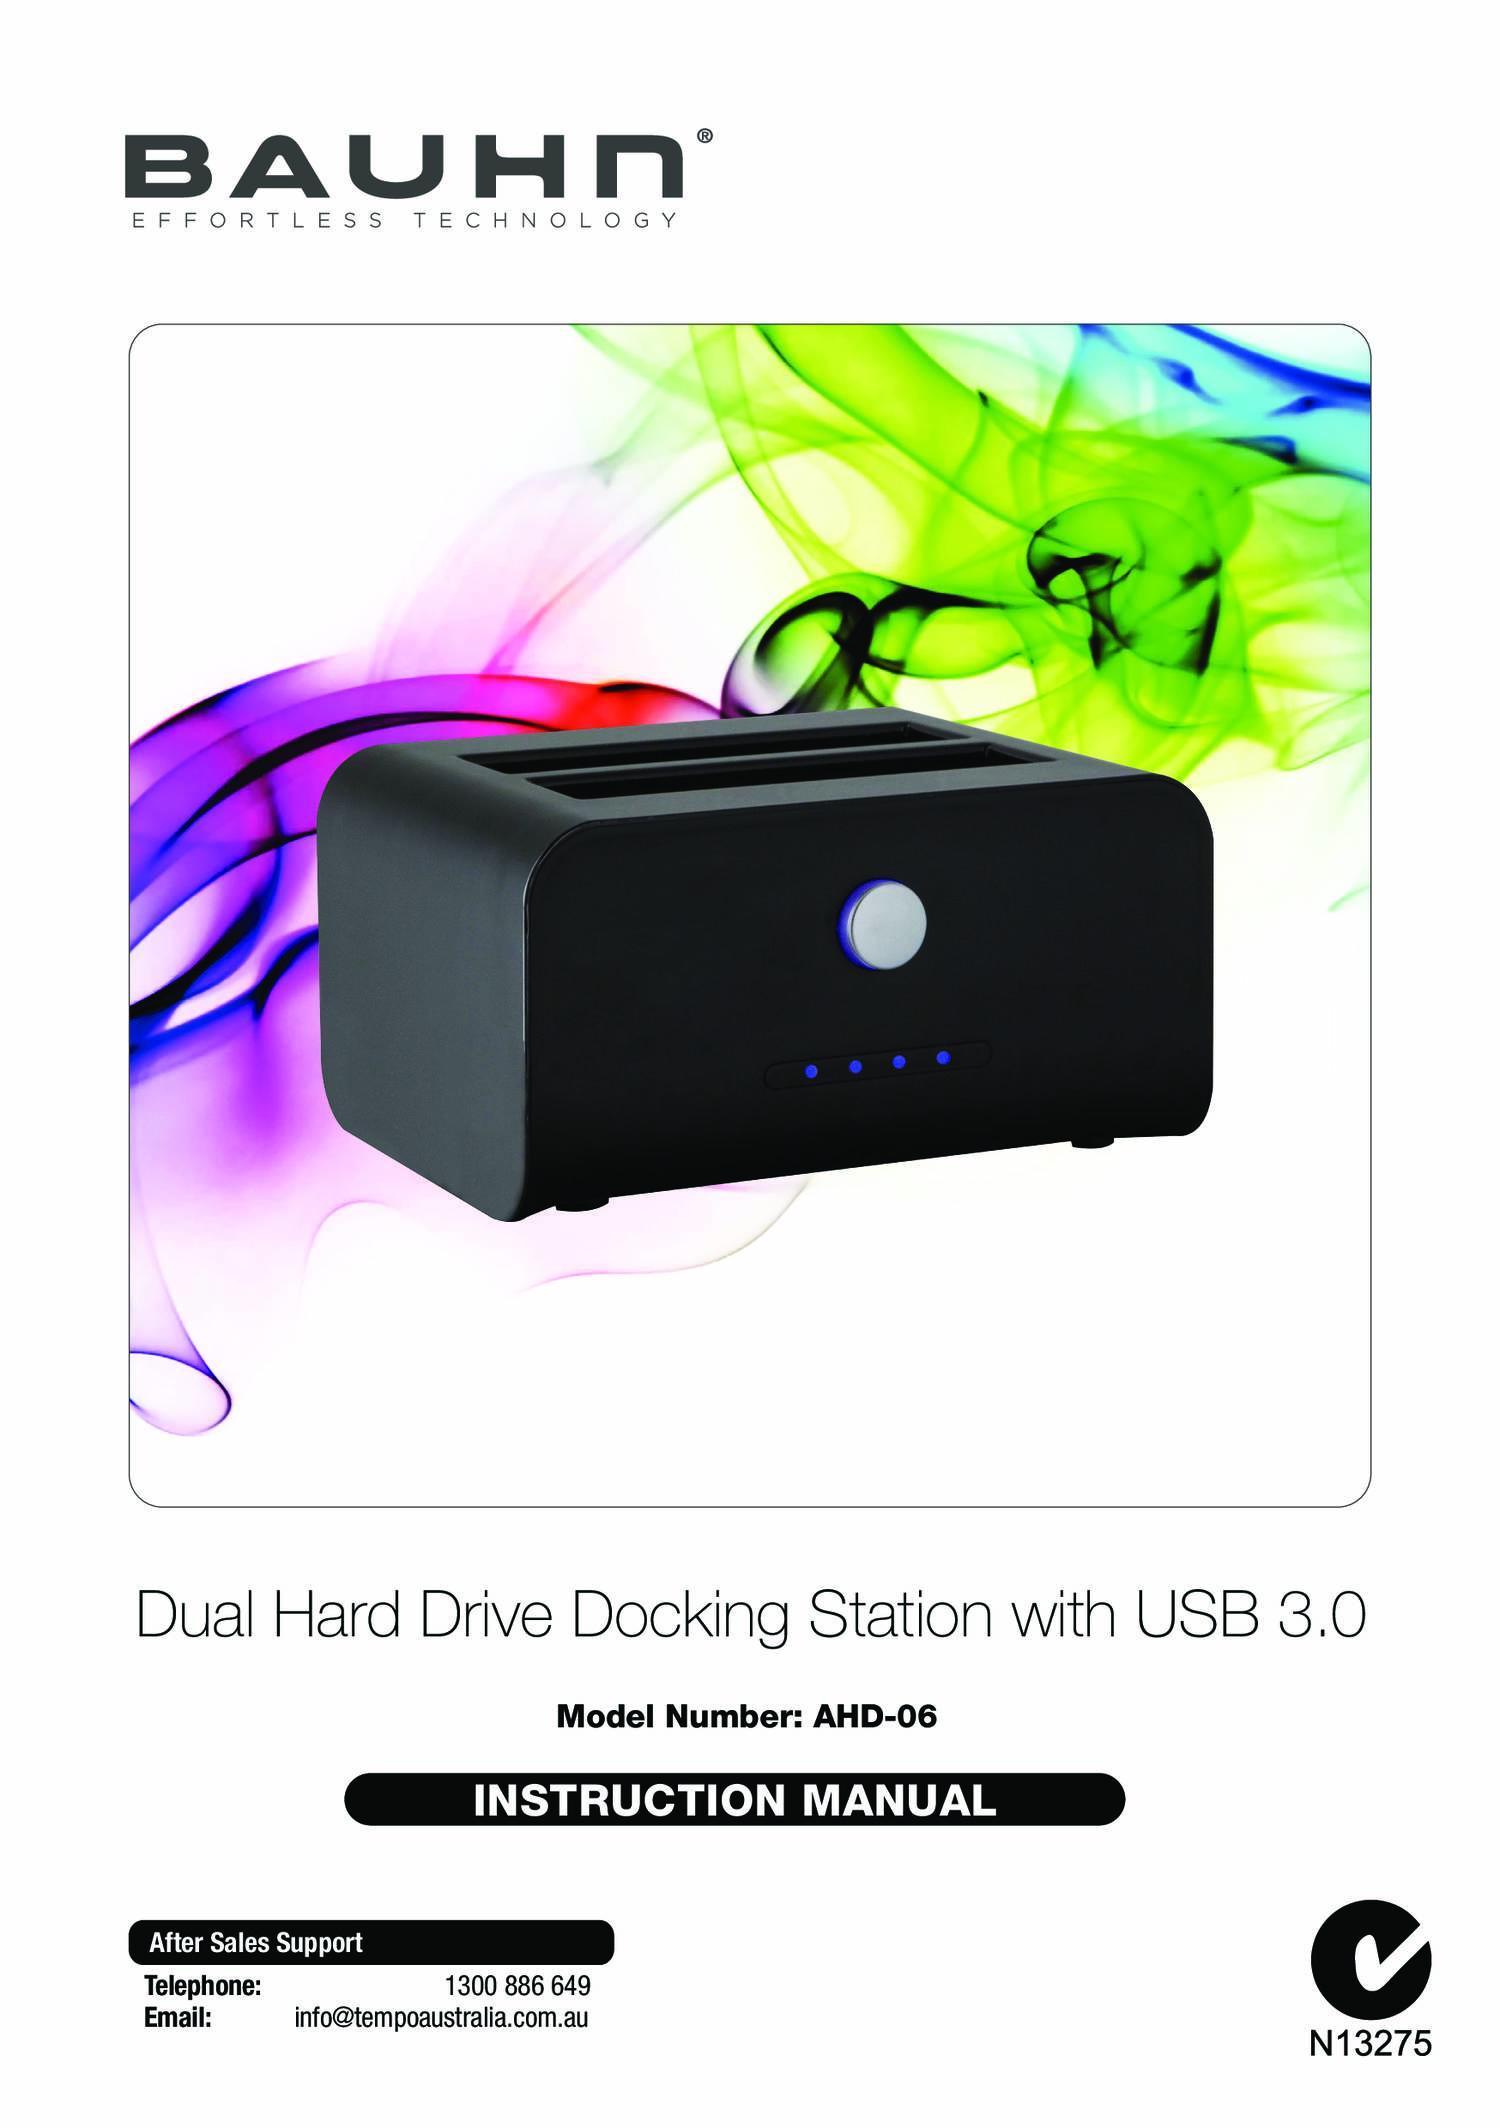 AHD-06 BAUHN Dual Hard Drive Docking Station IM.pdf   DocDroid